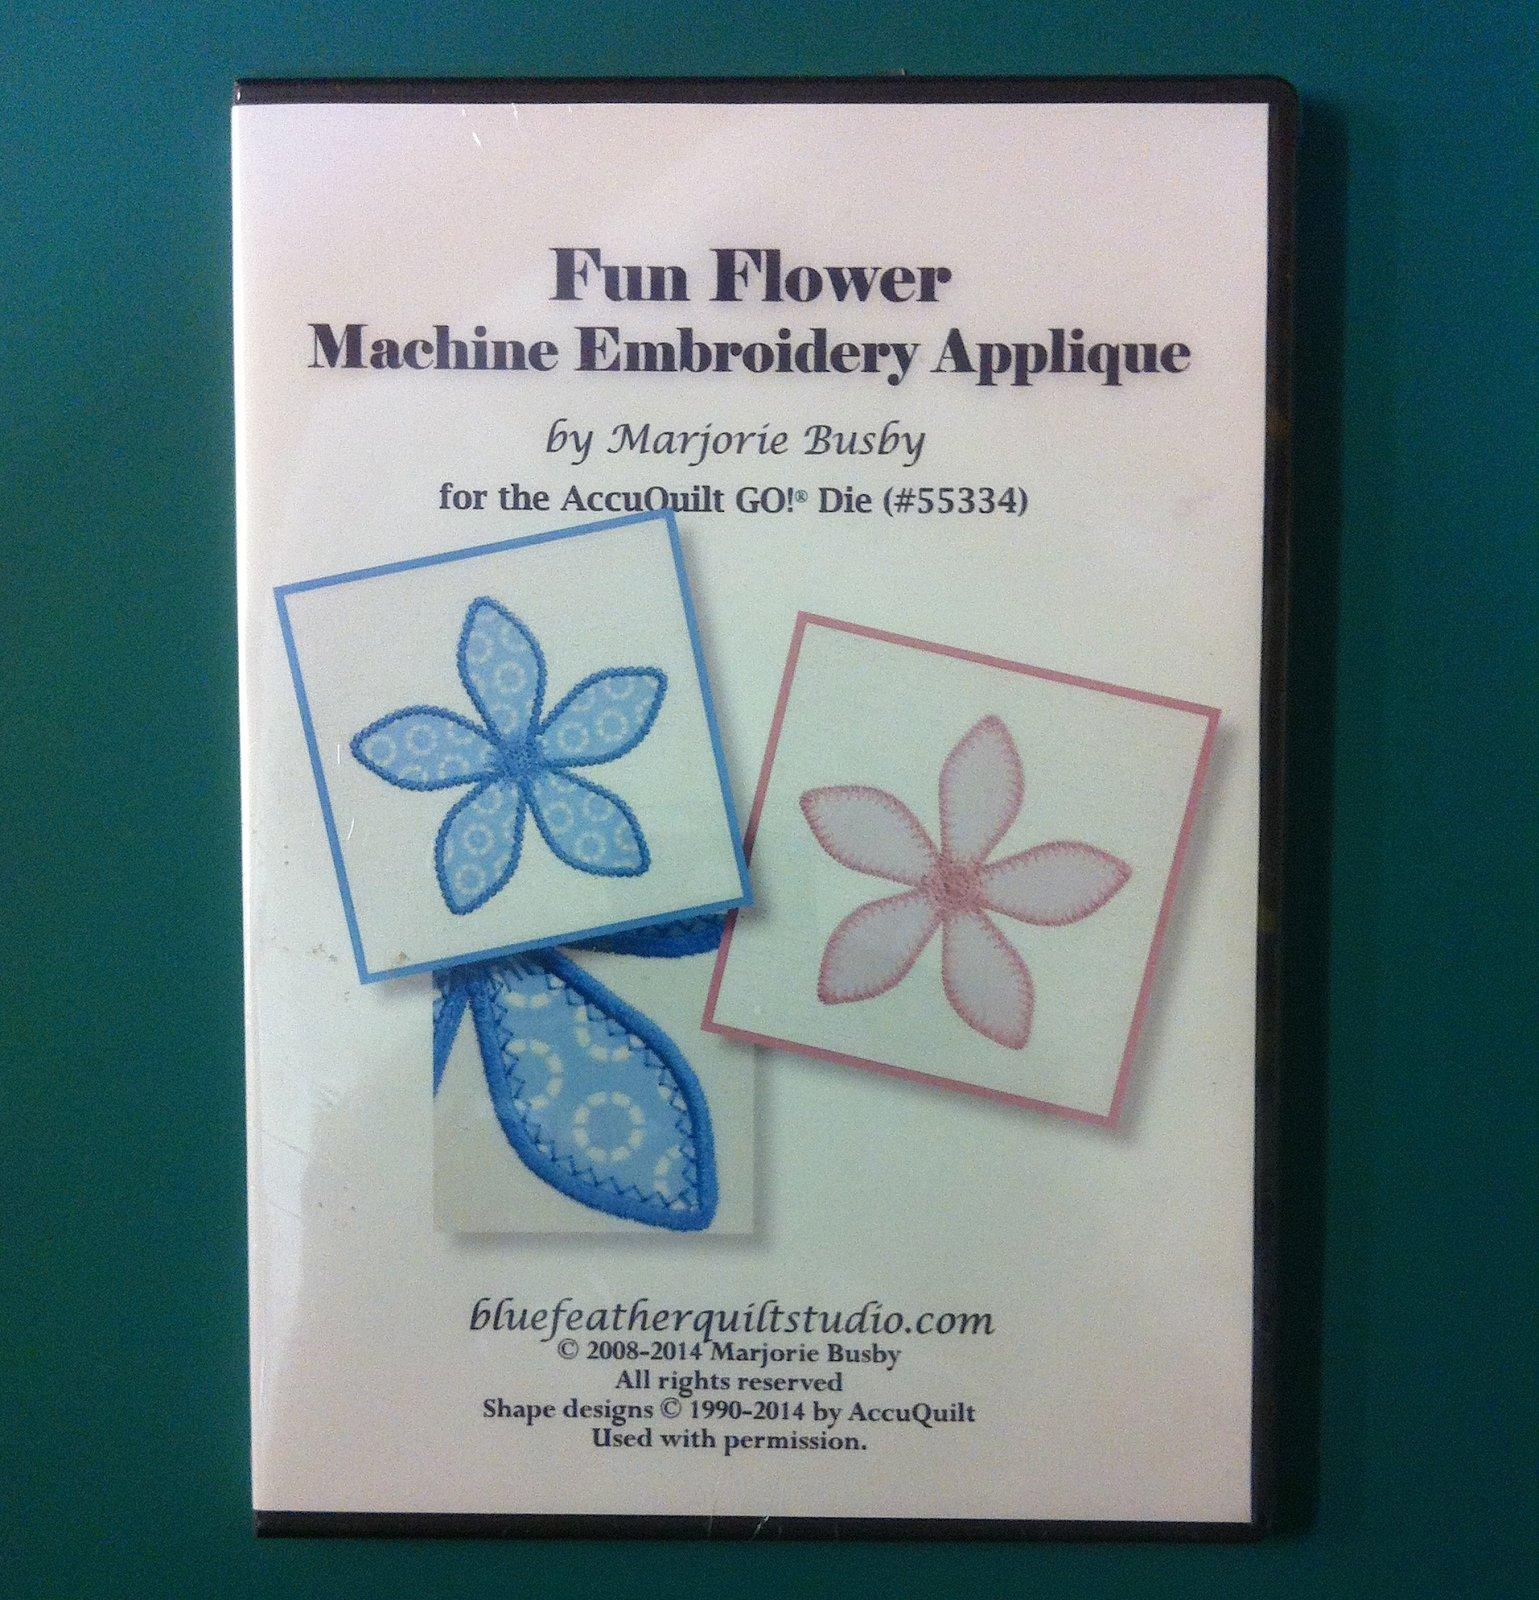 Fun Flower Machine Embroidery Applique